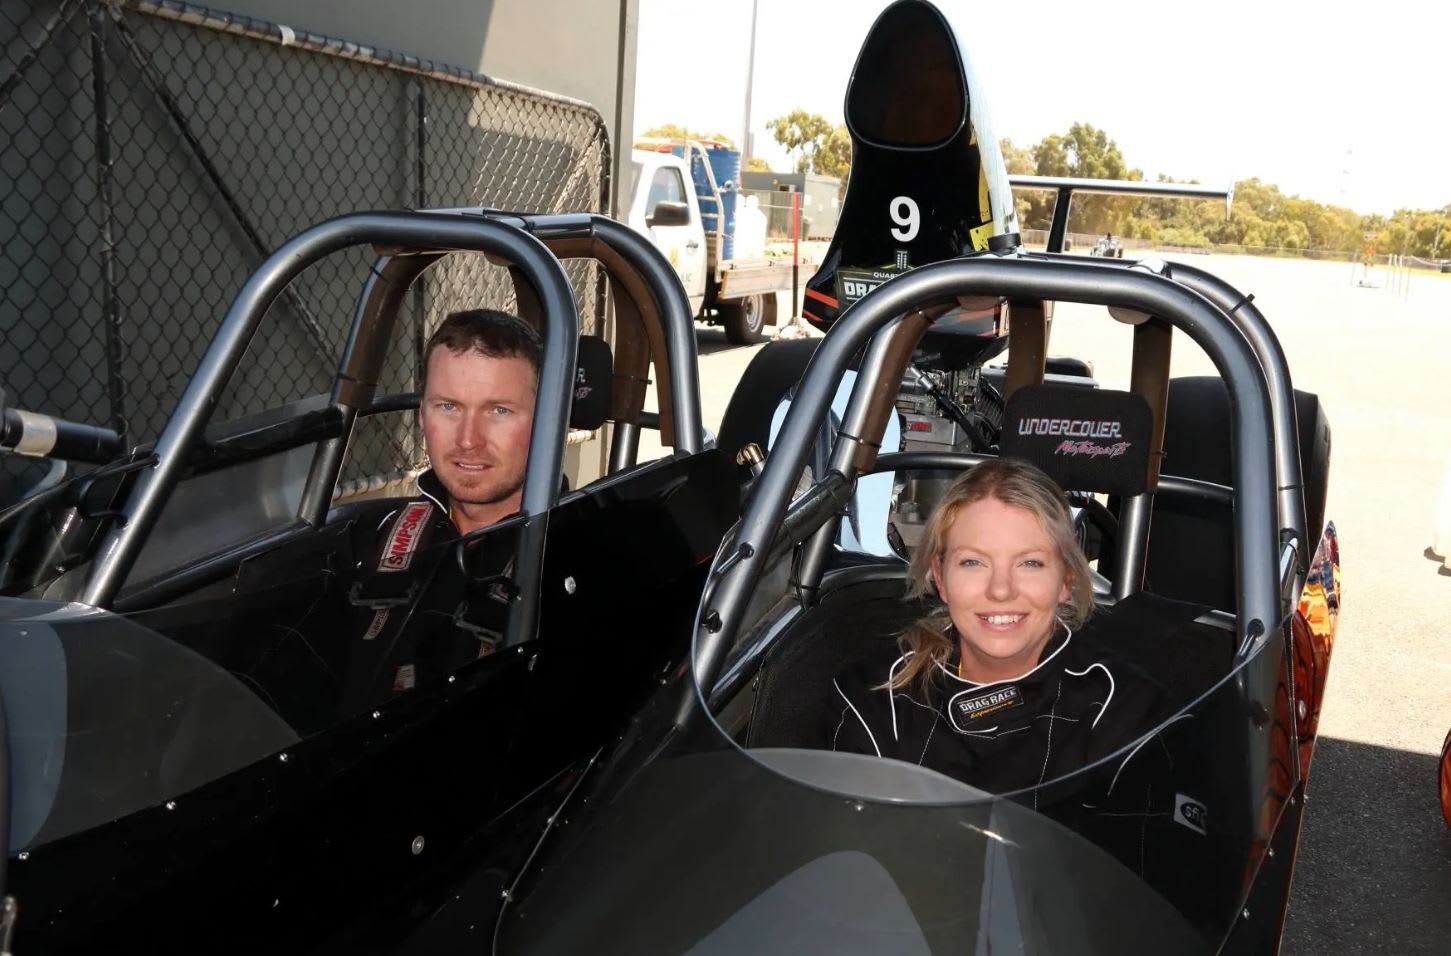 Quarter Mile Drag Race Experience - Perth